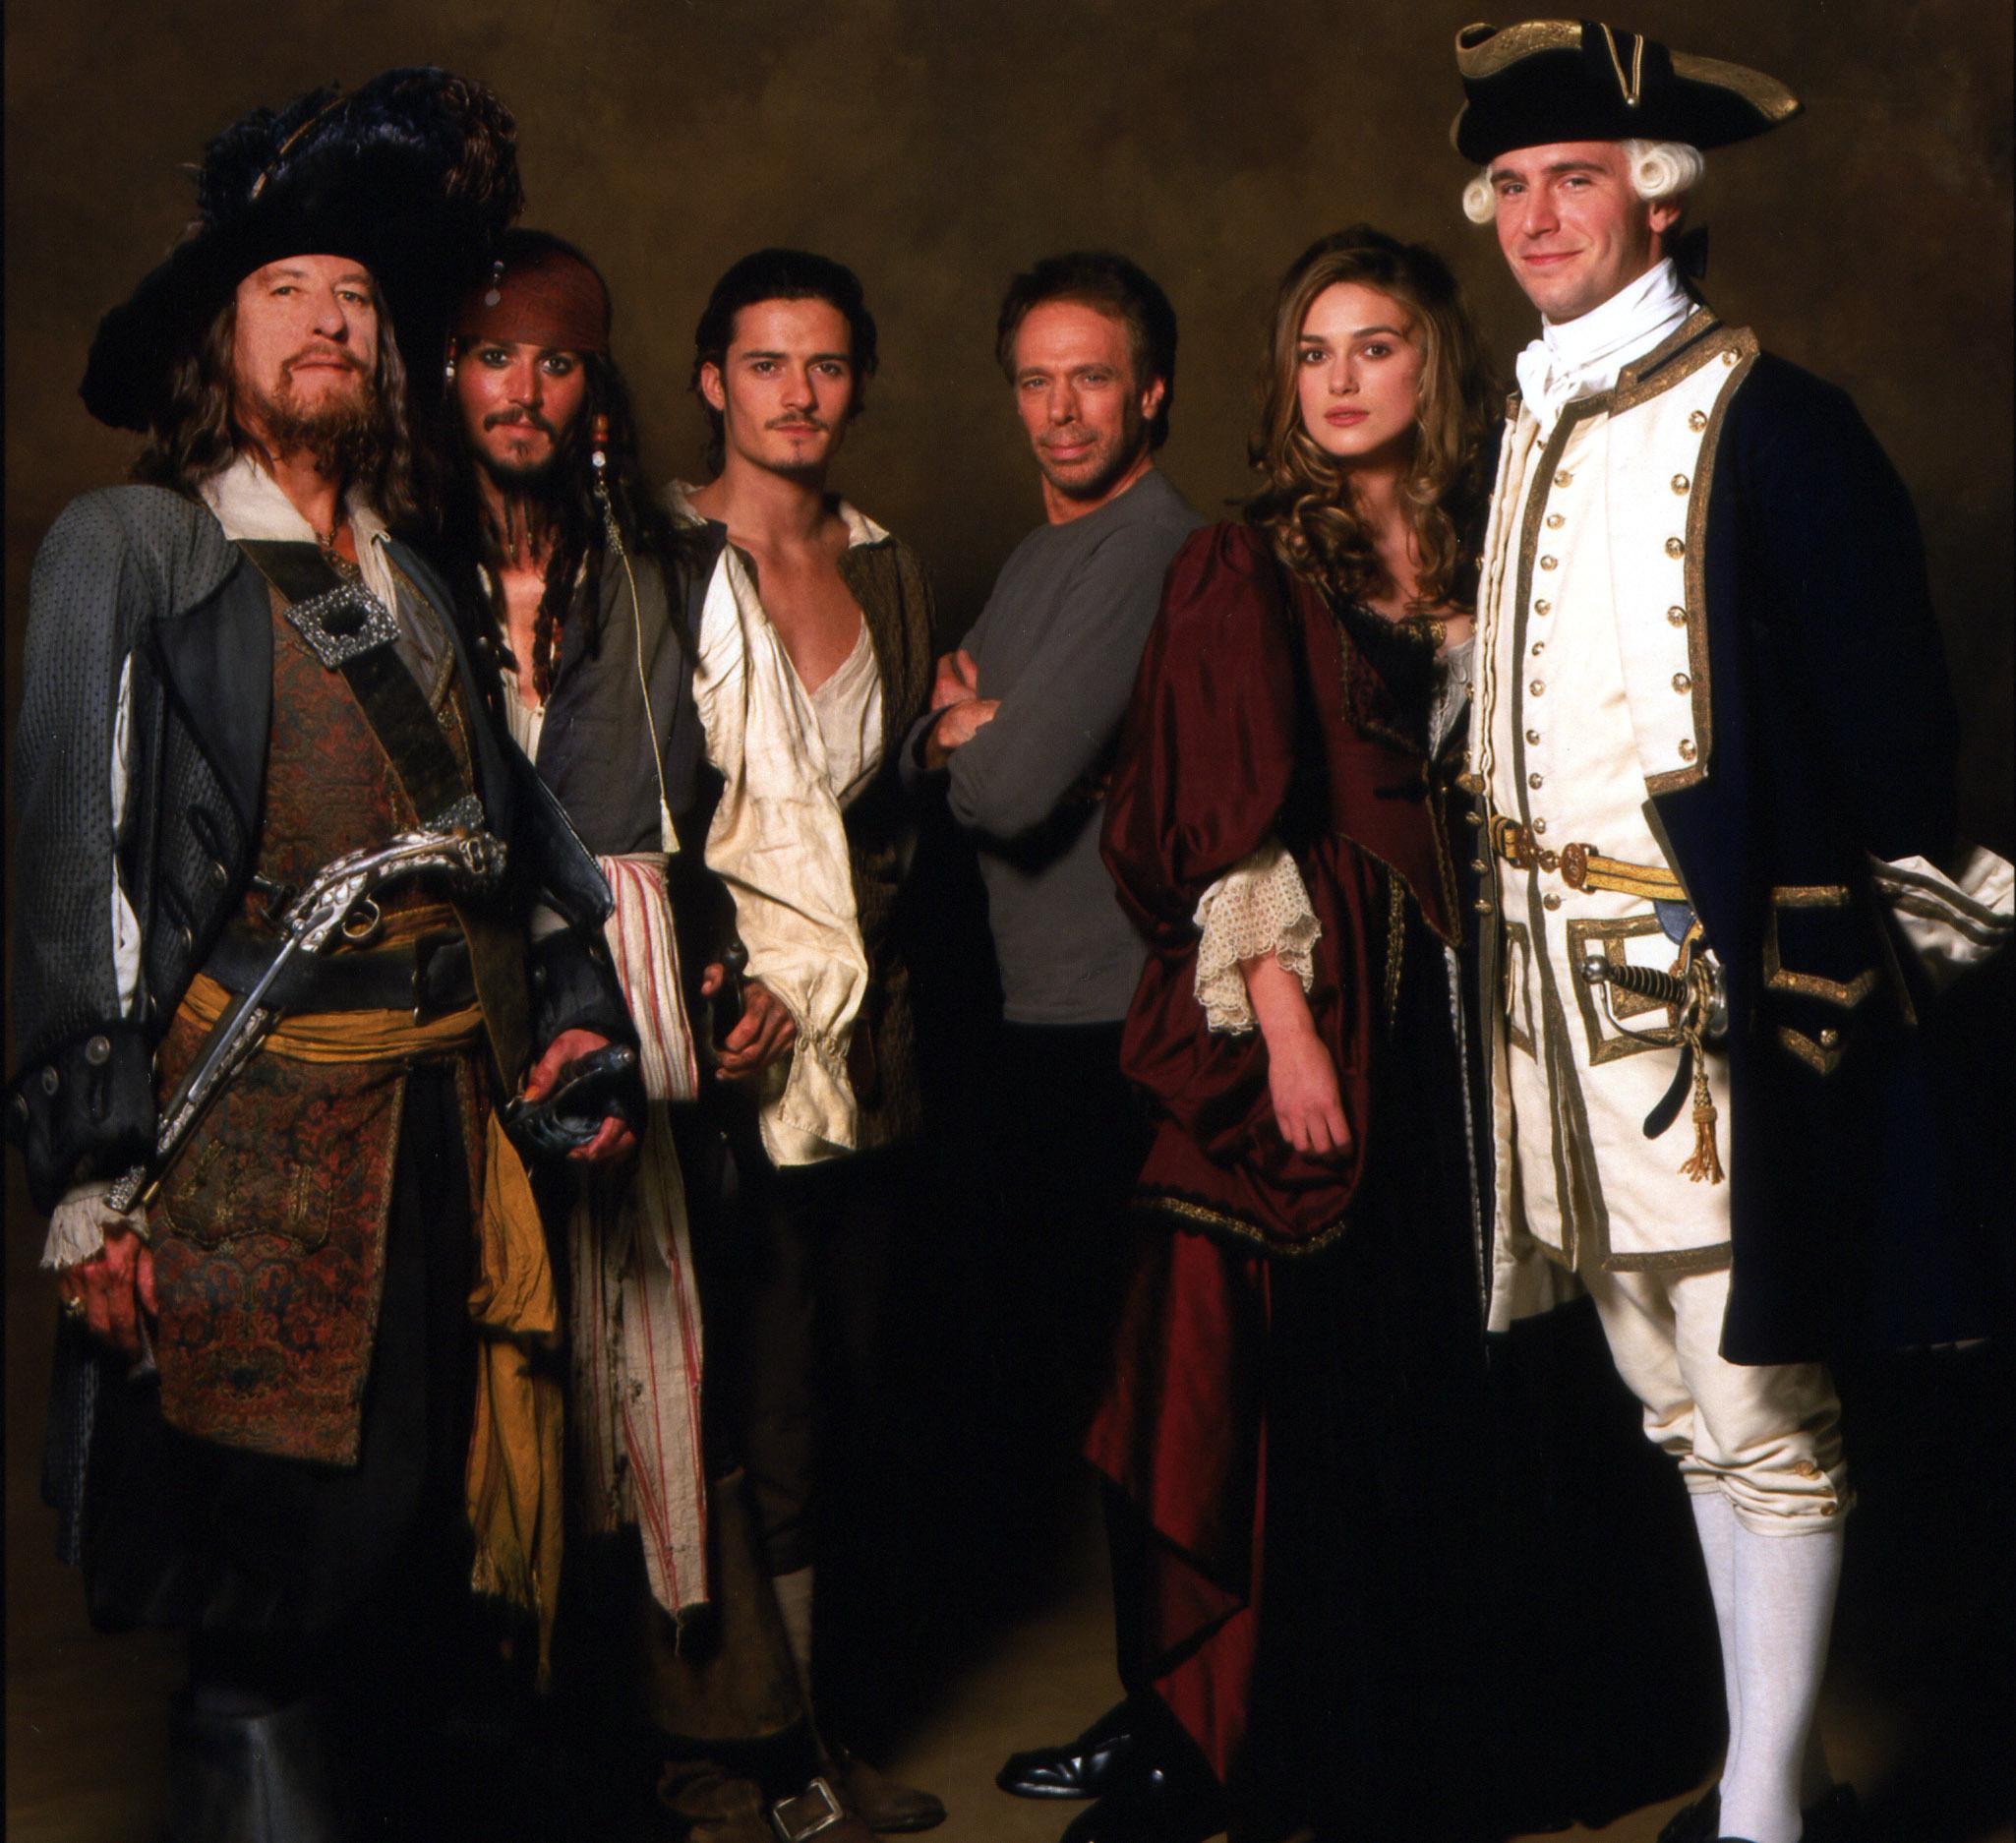 Keira Knightley Pirates 5 2017